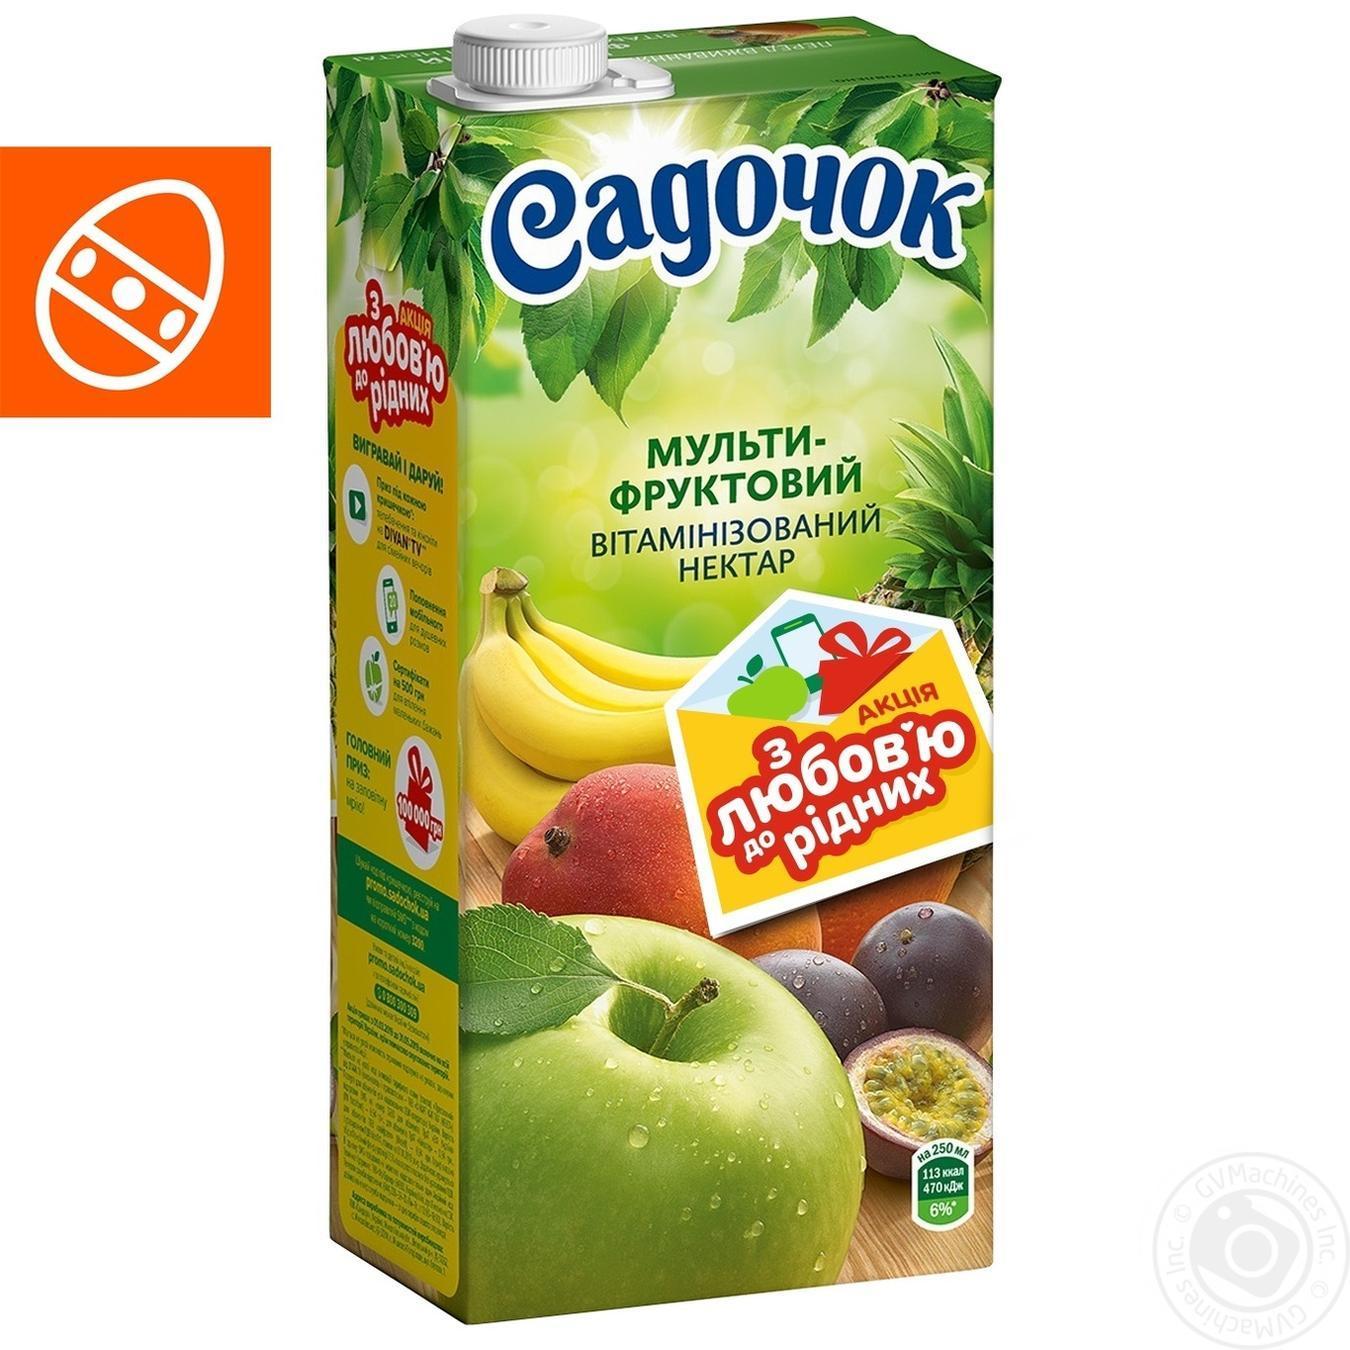 Нектар Садочок мультифруктовий 0,95л